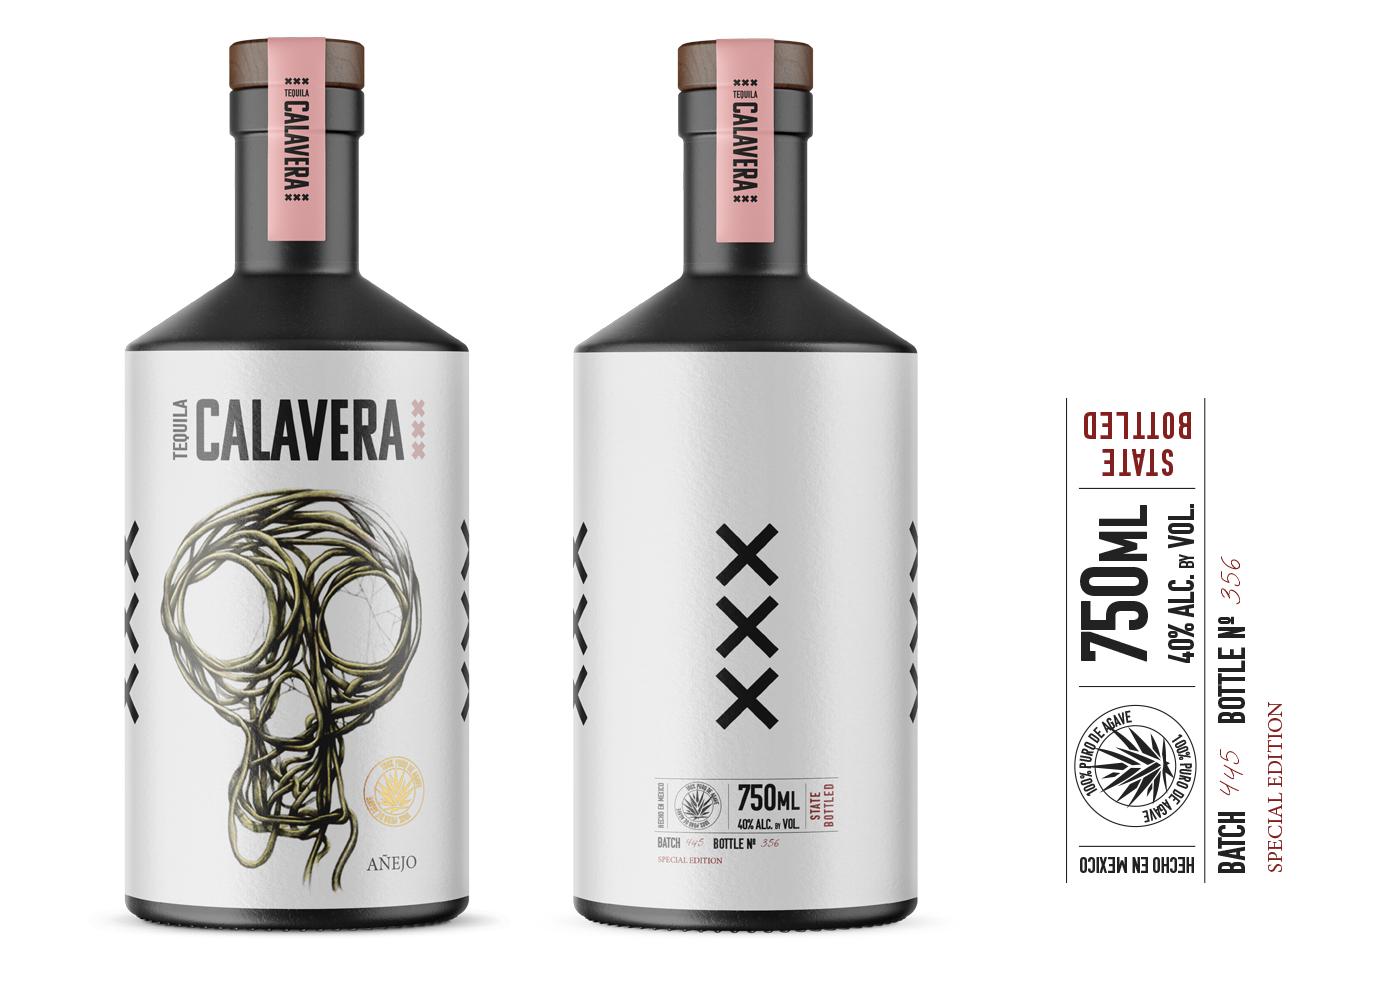 Elephant Estudio Create Tequila Calavera Concept